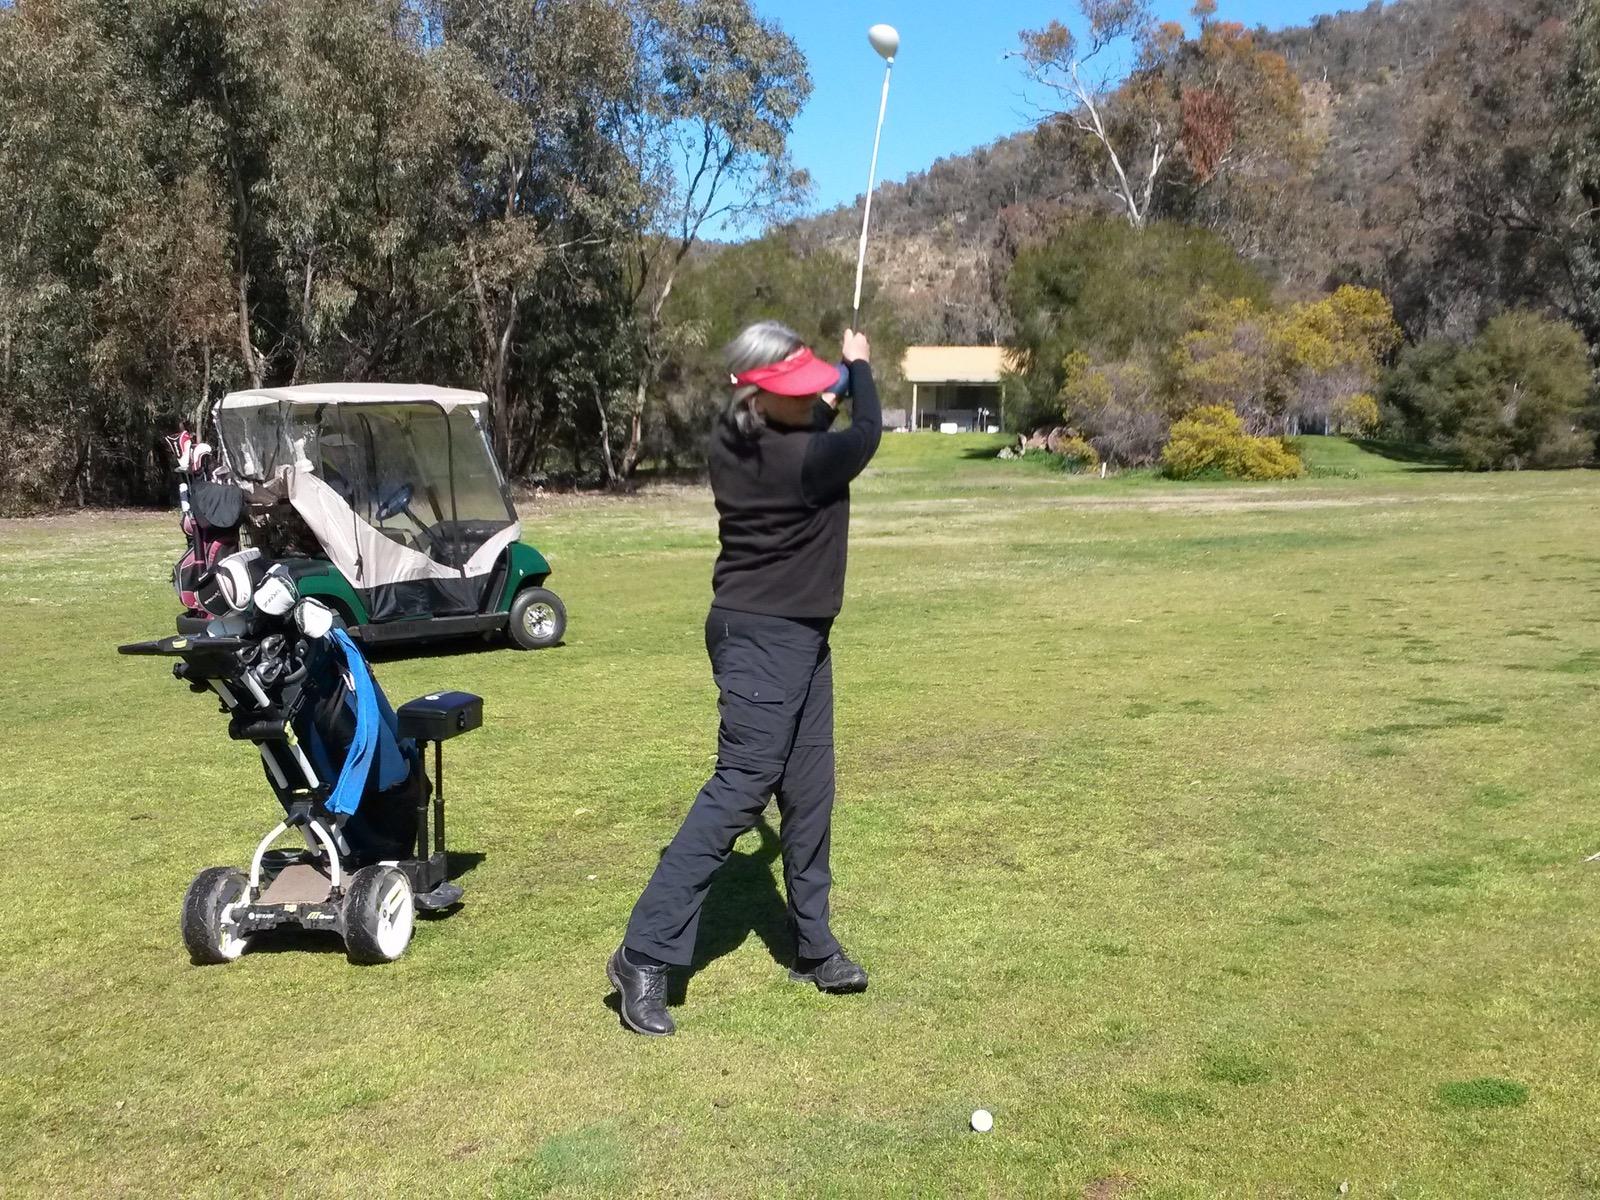 Latipsoh Charity Golf Day